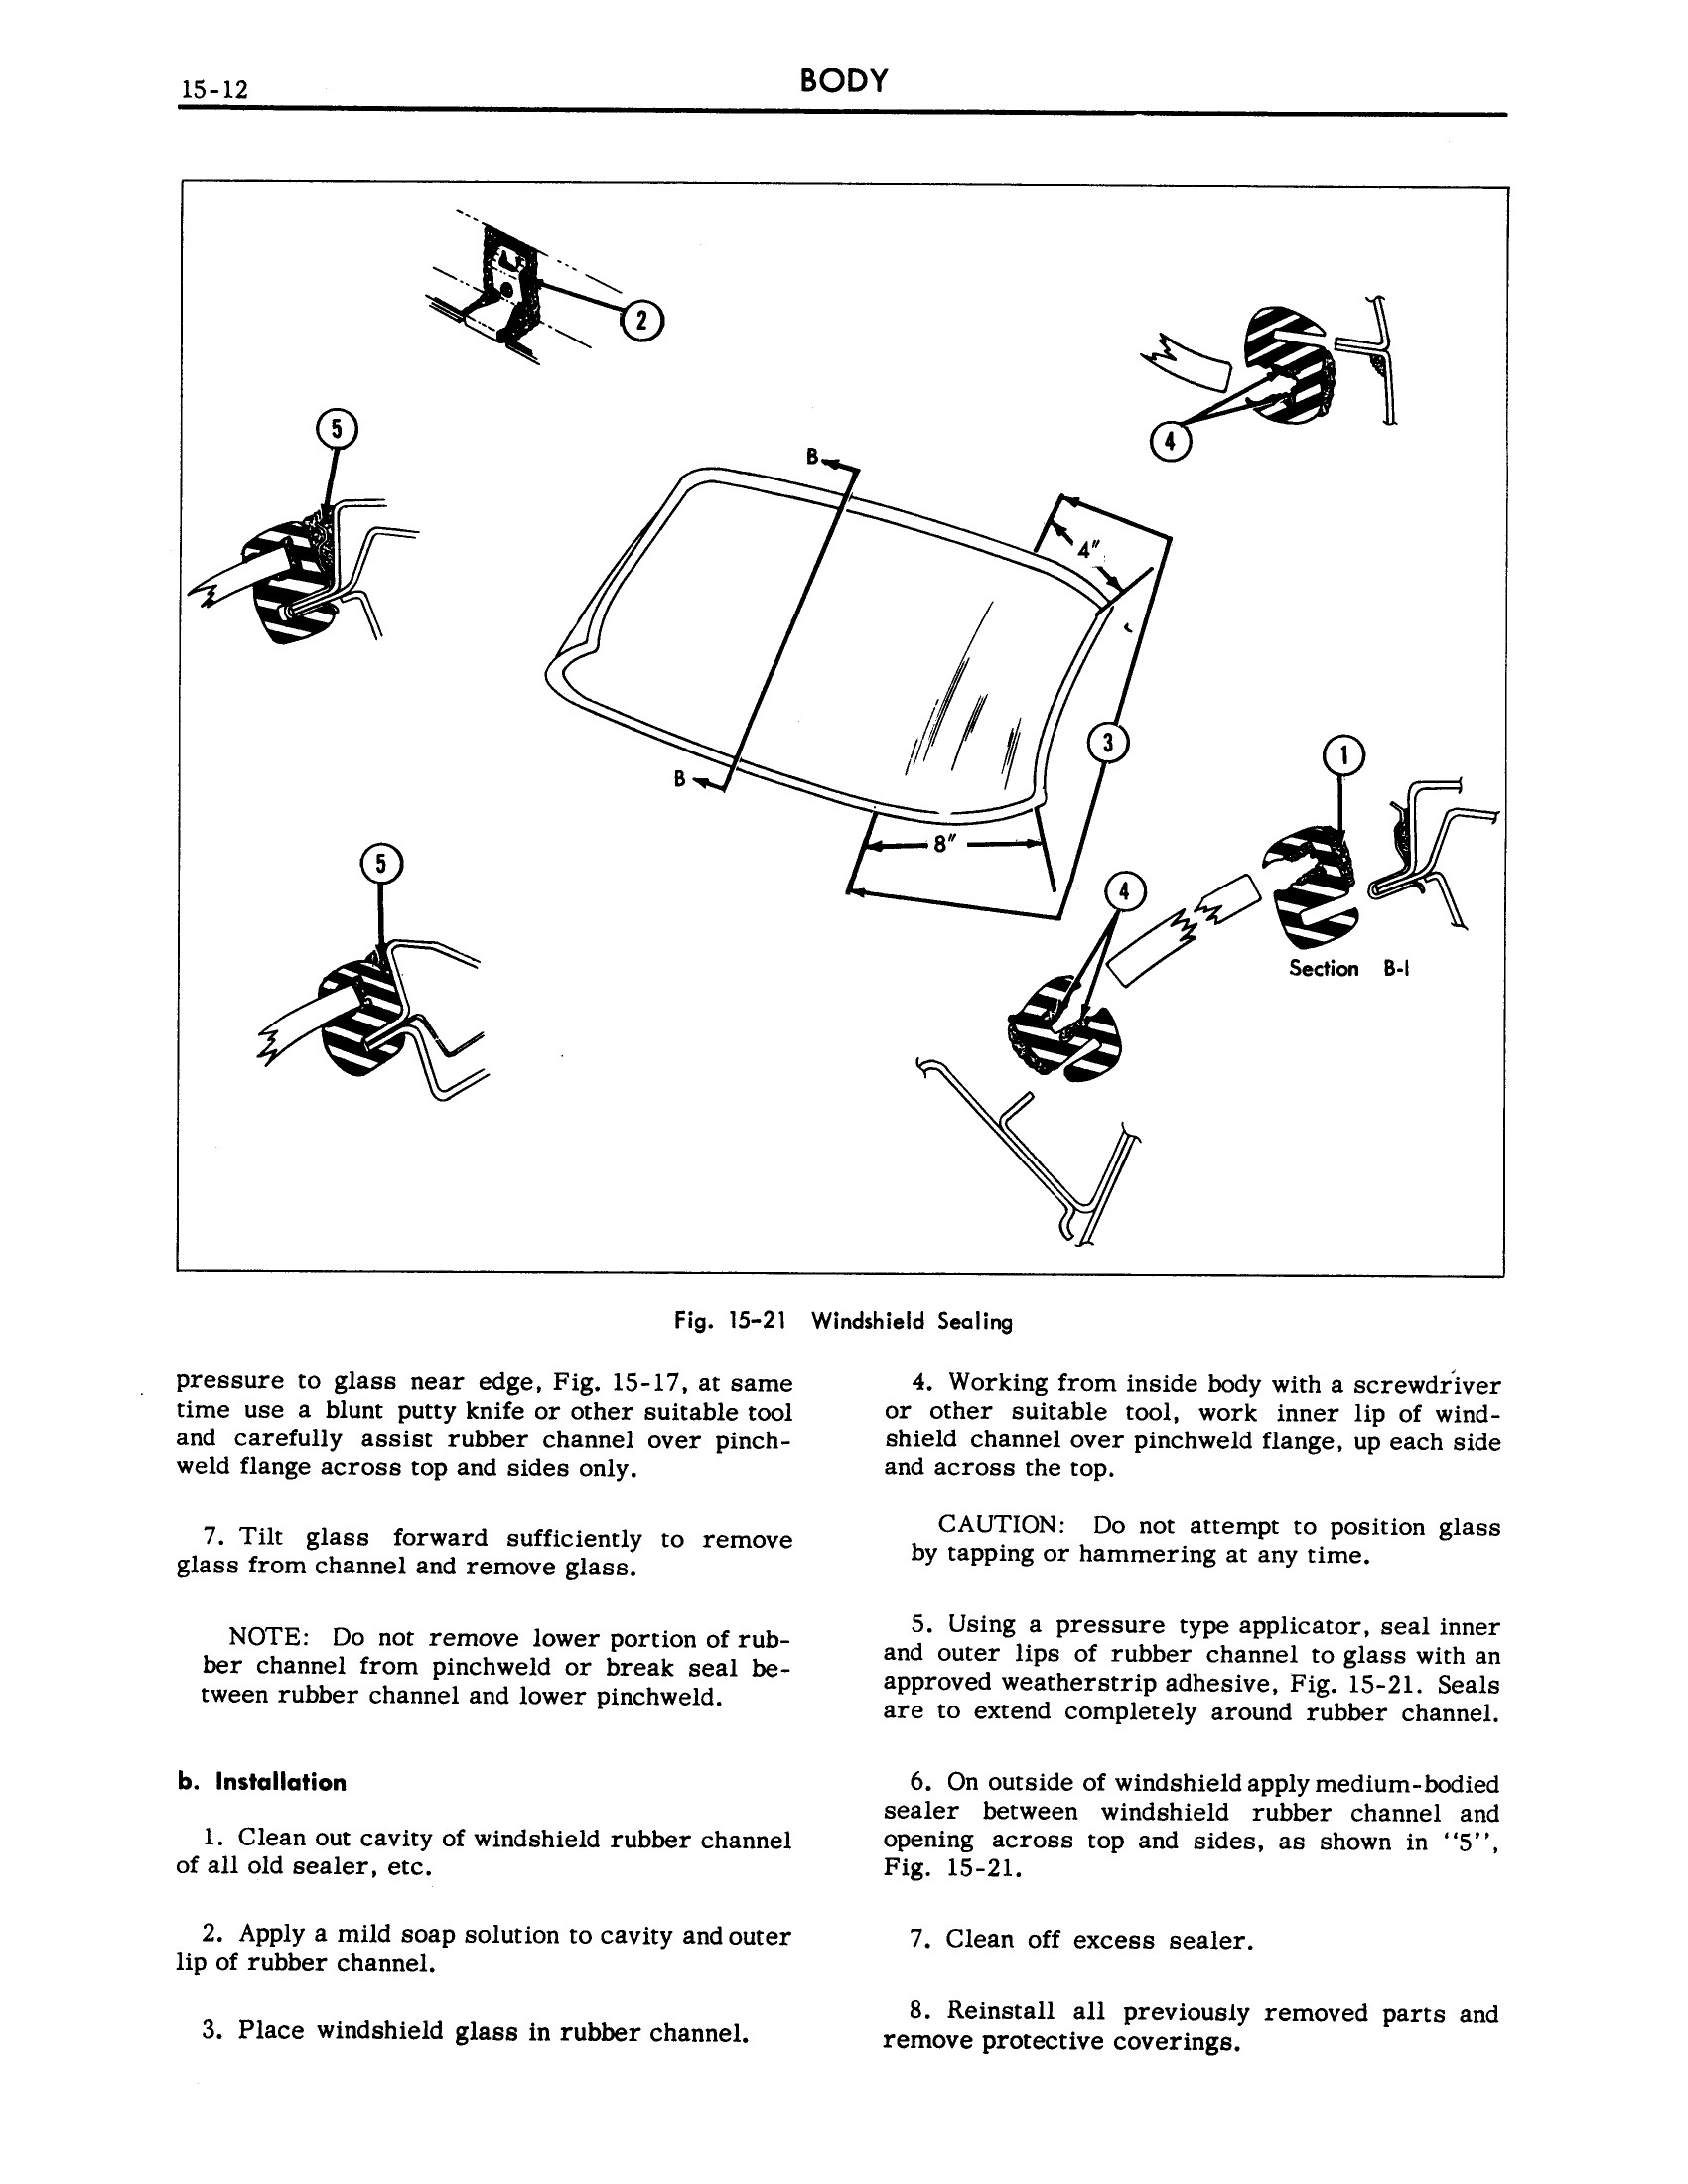 1961 Cadillac Shop Manual- Body Page 12 of 114